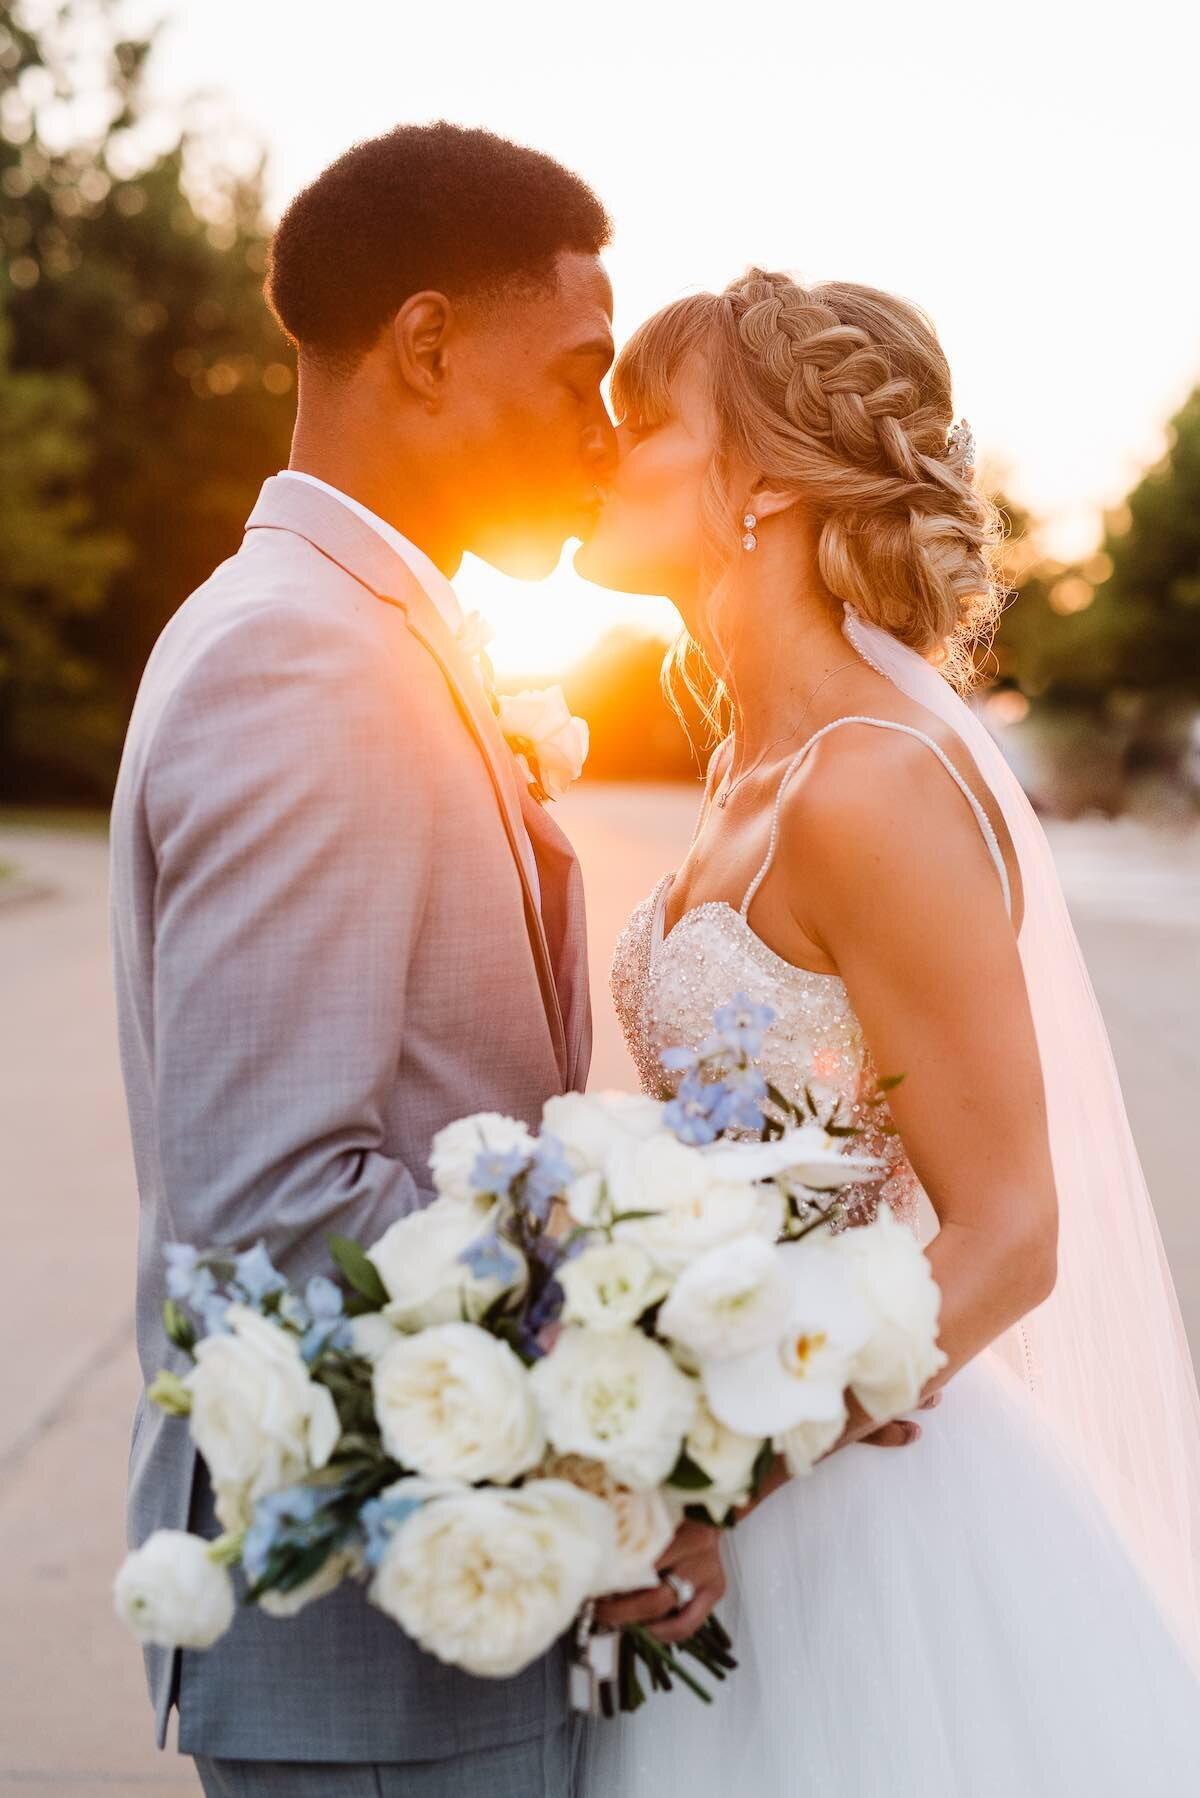 Oklahoma wedding photographer, OKC wedding photography, Edmond wedding photographer